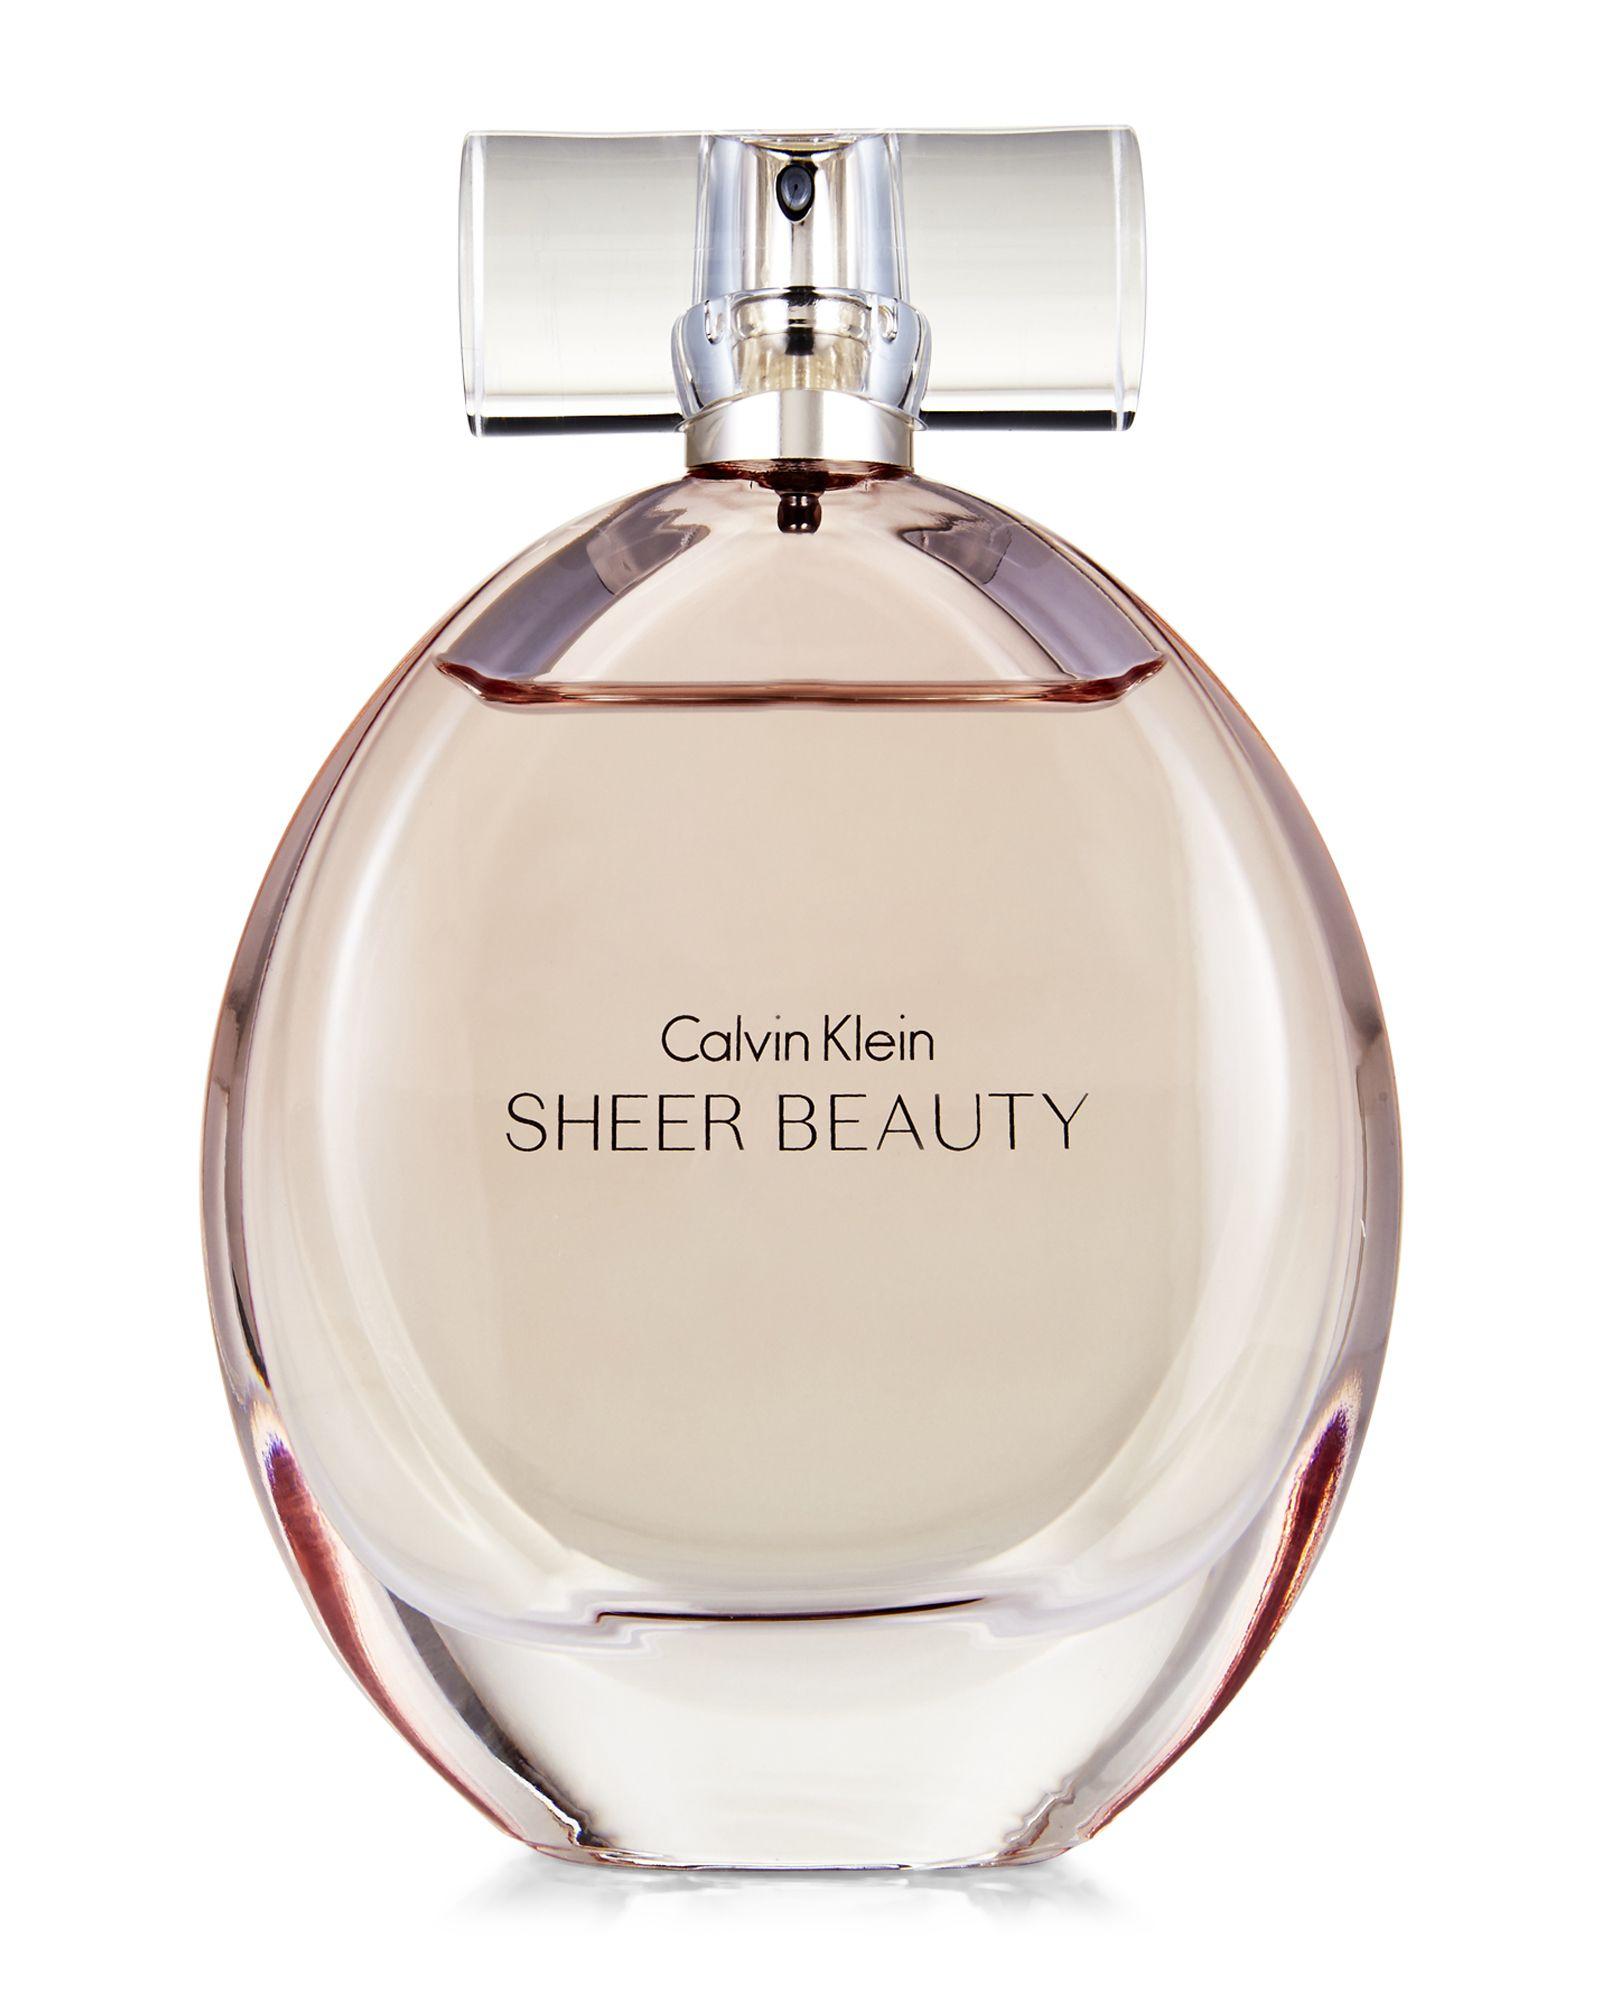 Calvin Klein Sheer Beauty Eau De Toilette 3 4 Oz Spray Calvin Klein Sheer Beauty Perfume Luxury Perfume